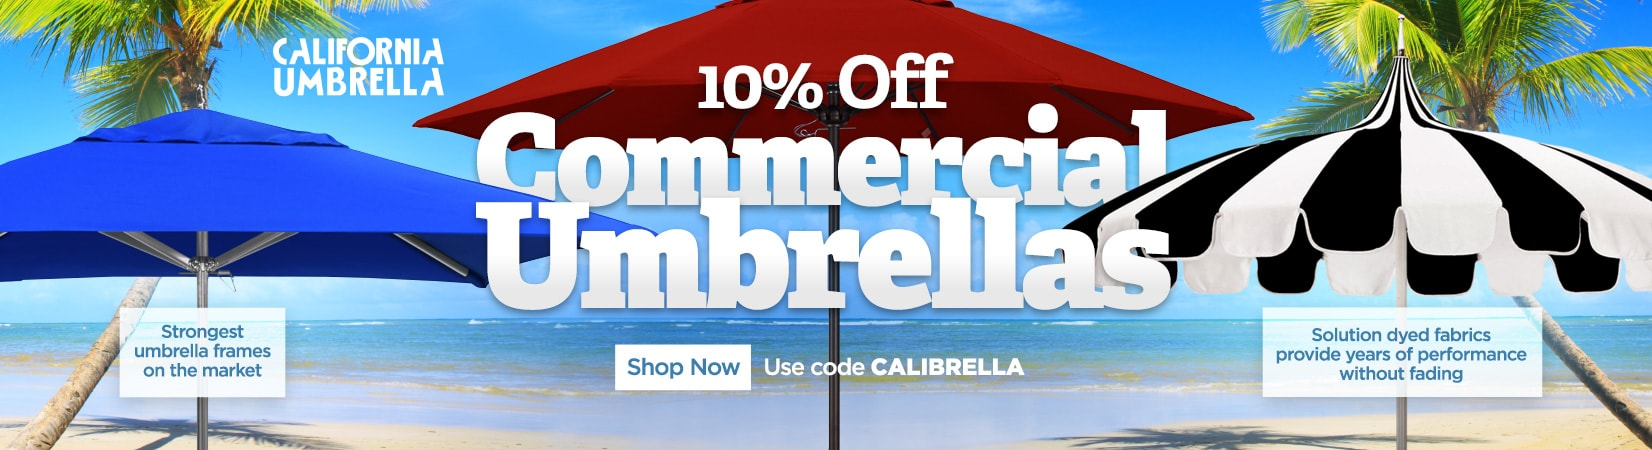 Commercial Restaurant Supplies Equipment From Webstaurant